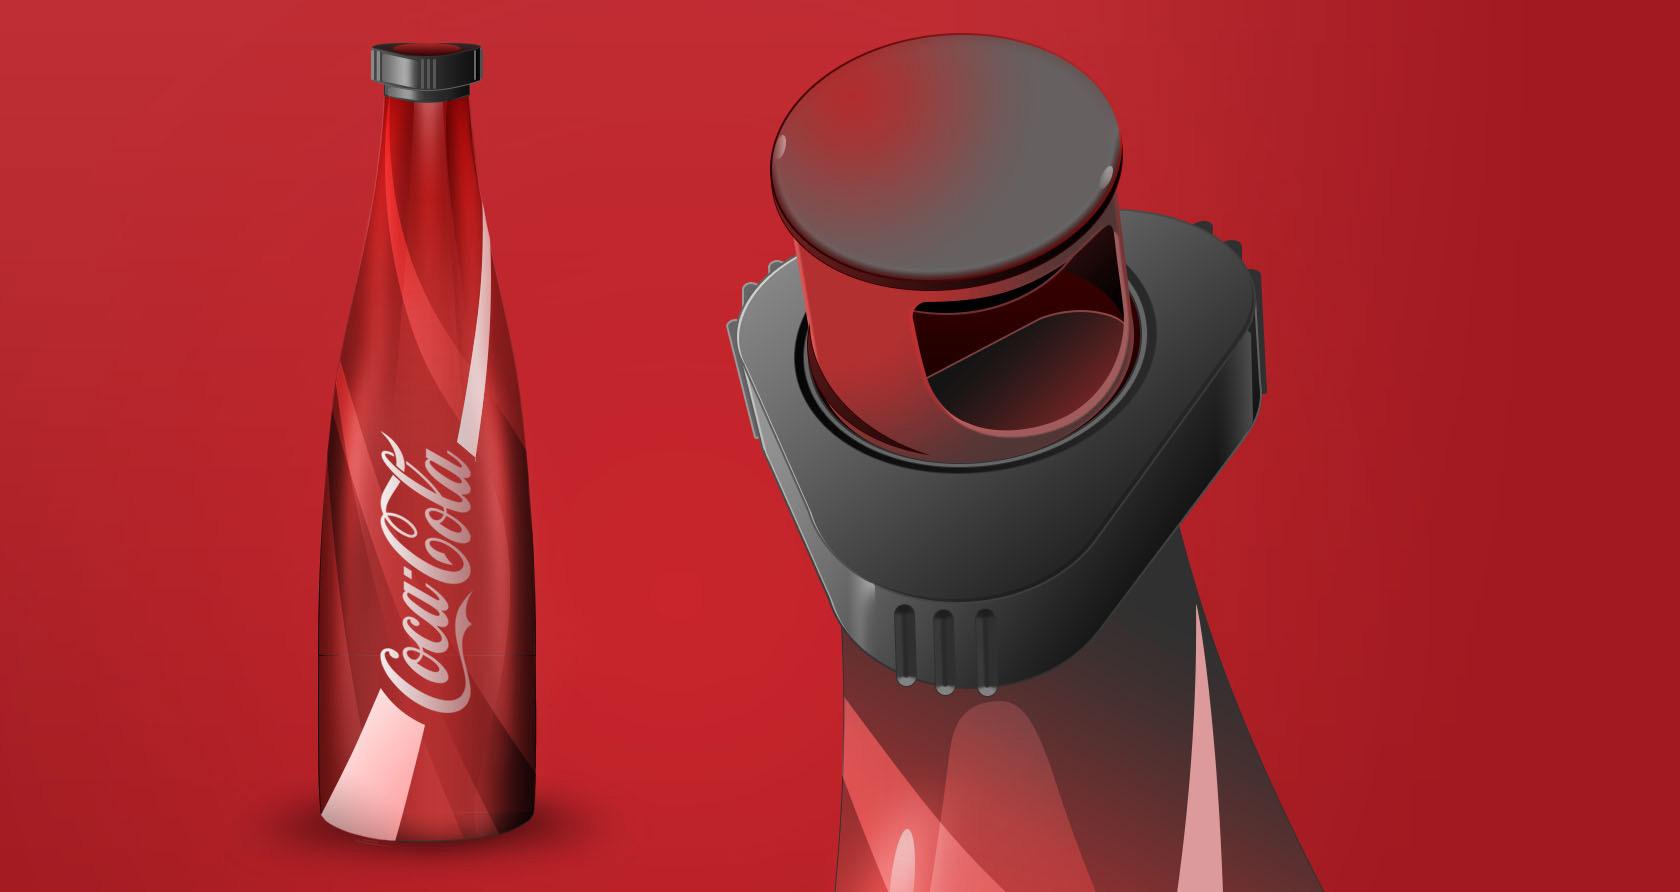 Coca Cola(2019)